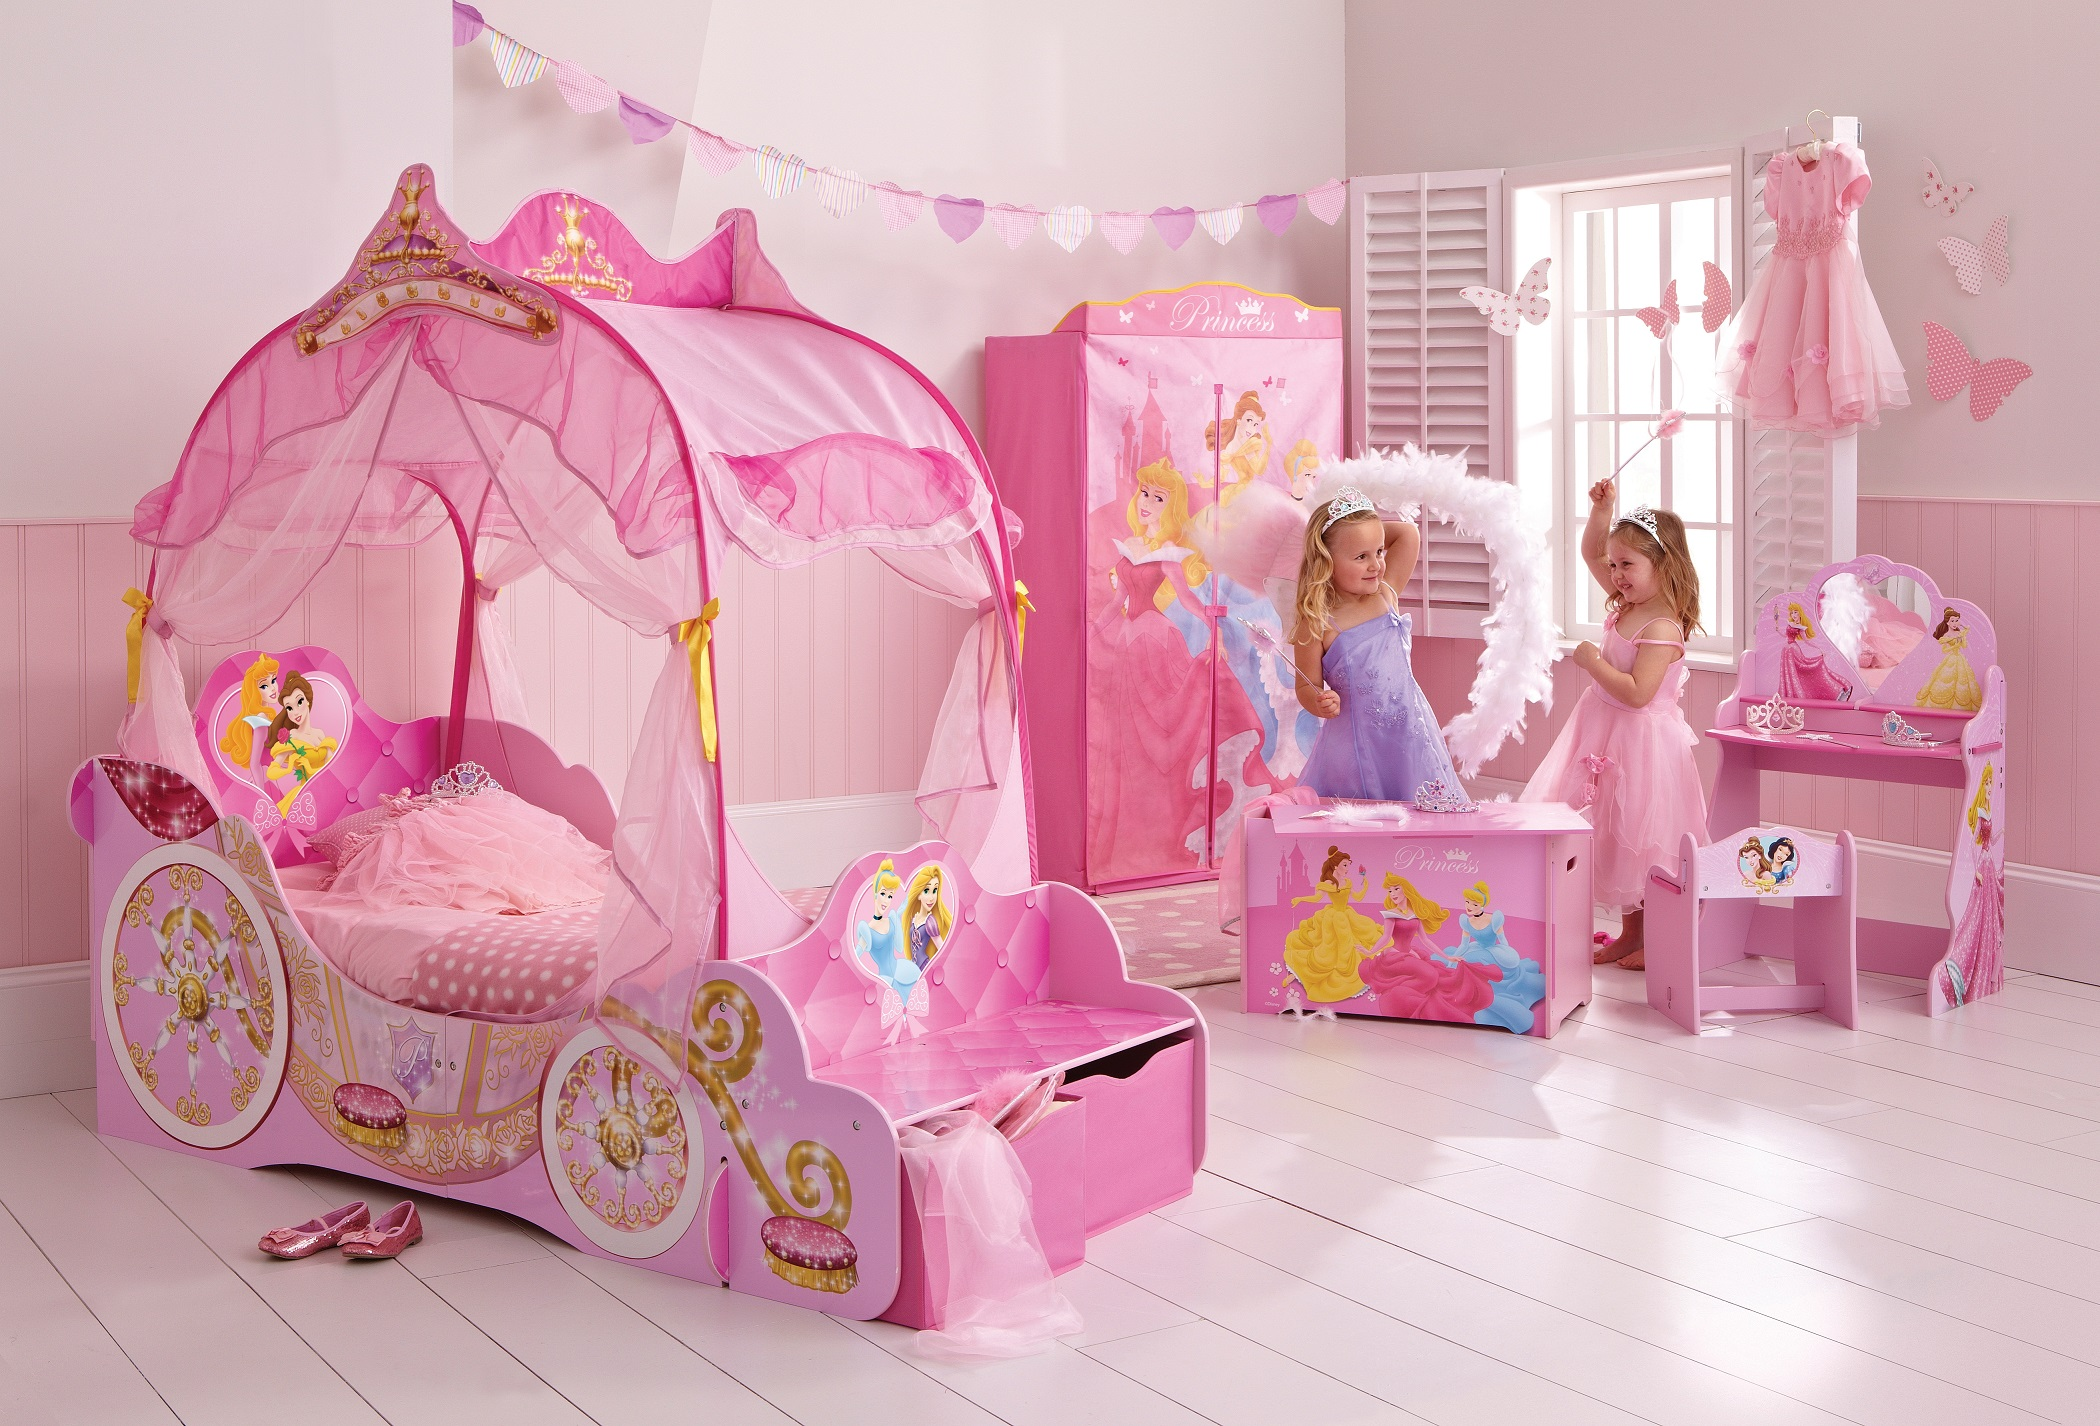 Комната для девочки с принцессами